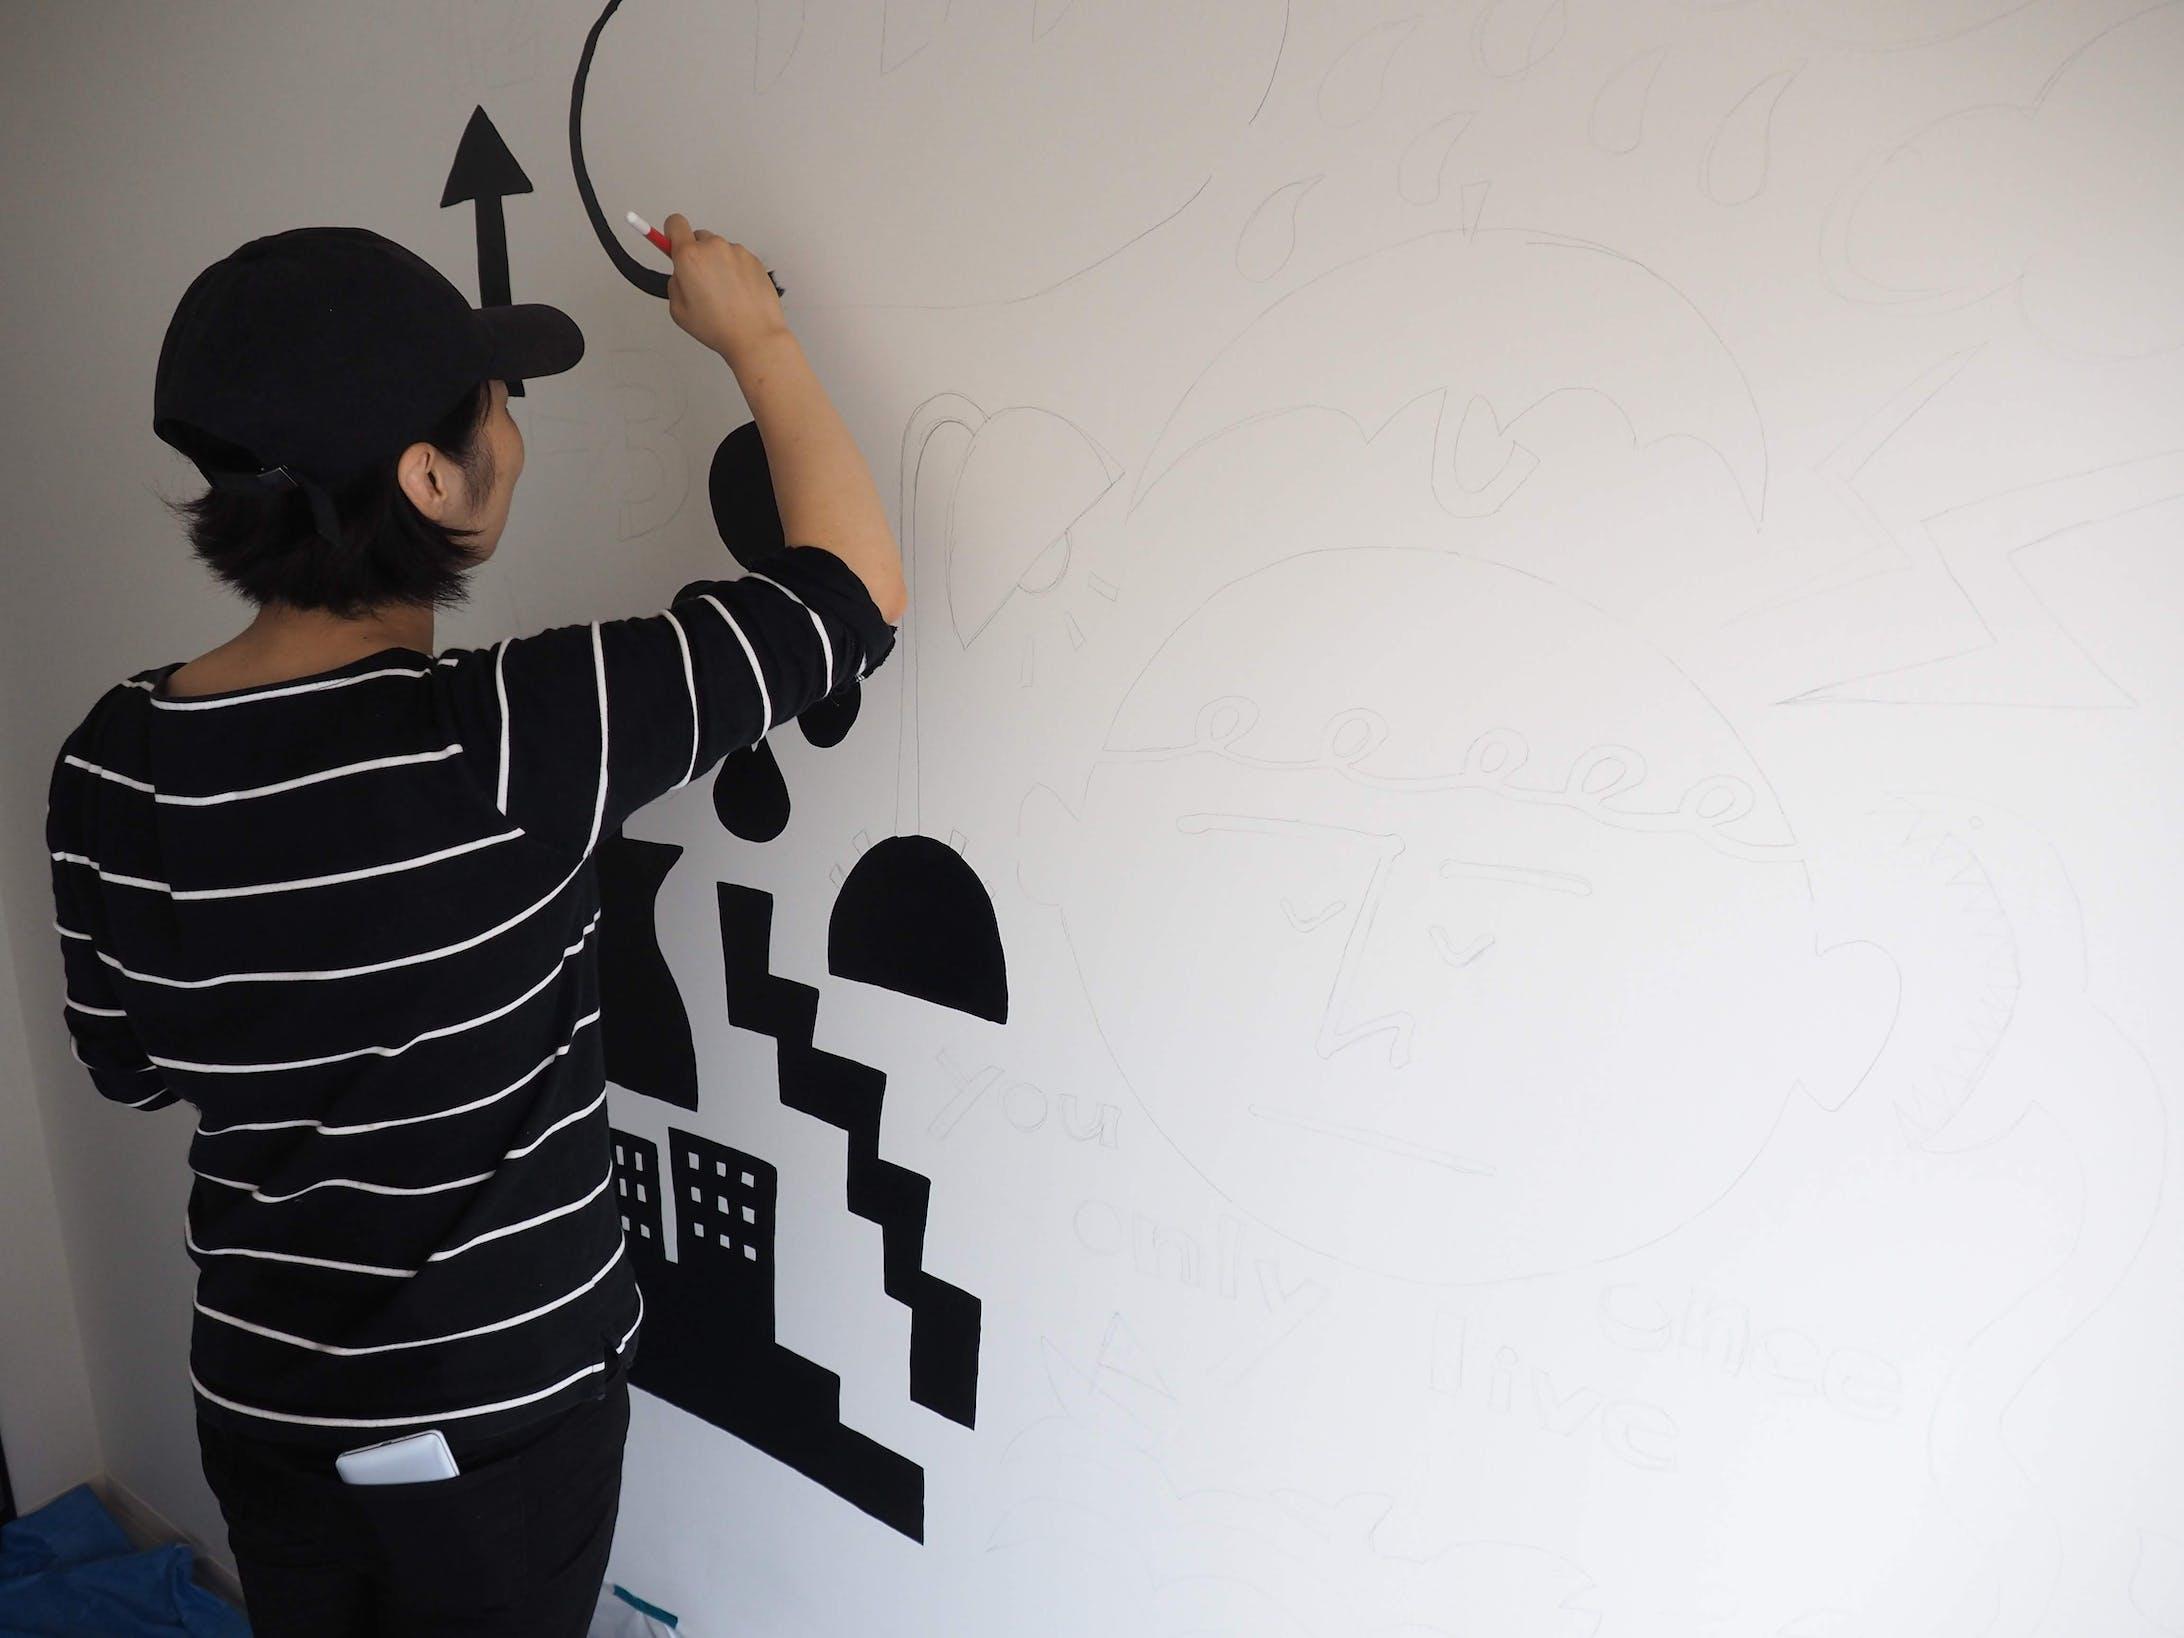 【壁画制作】YOLO BASE-4